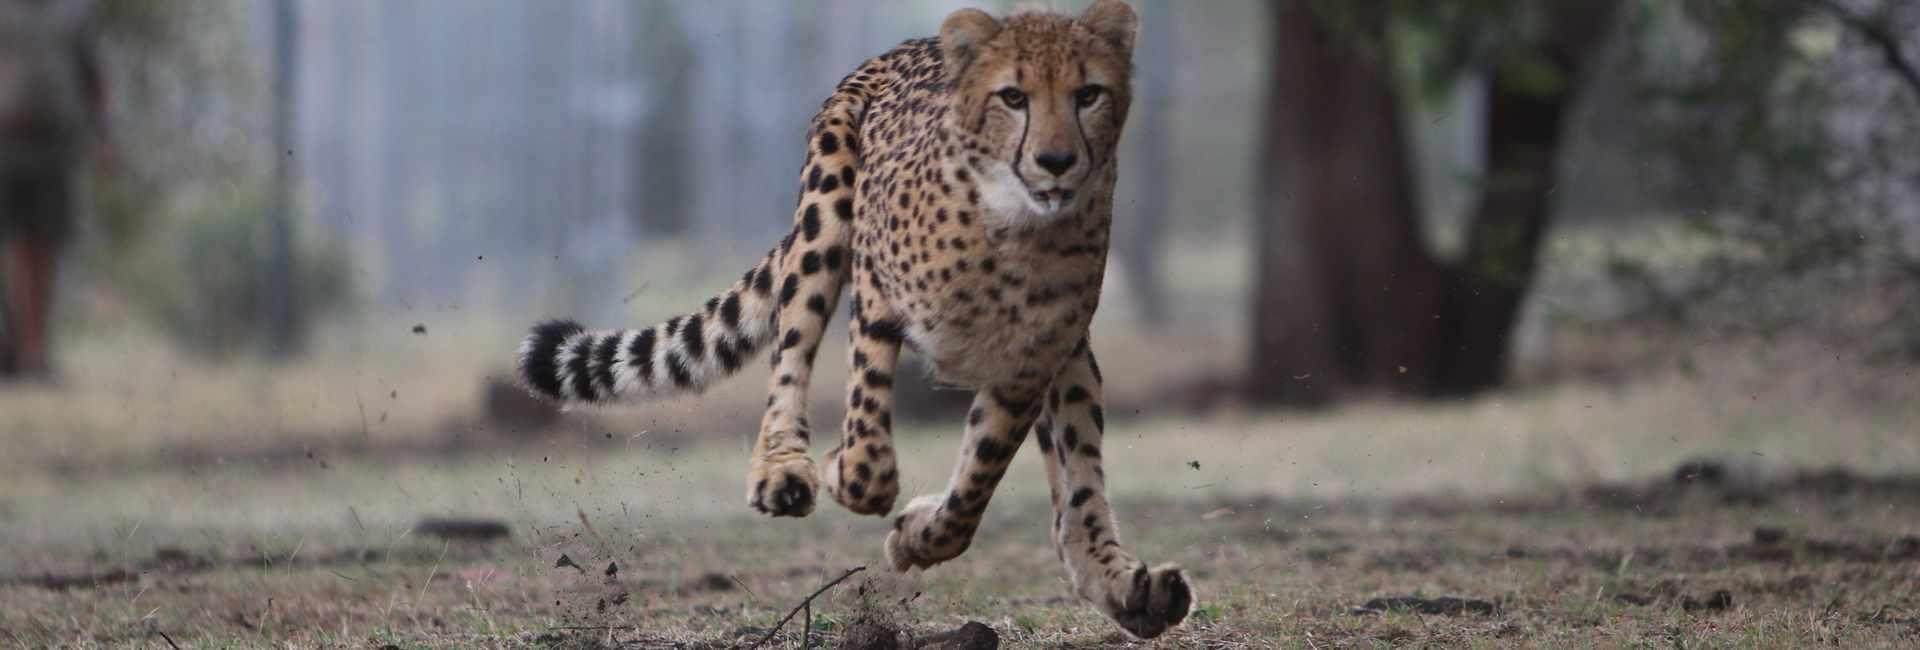 cheetahs  the world u0026 39 s fastest land animal